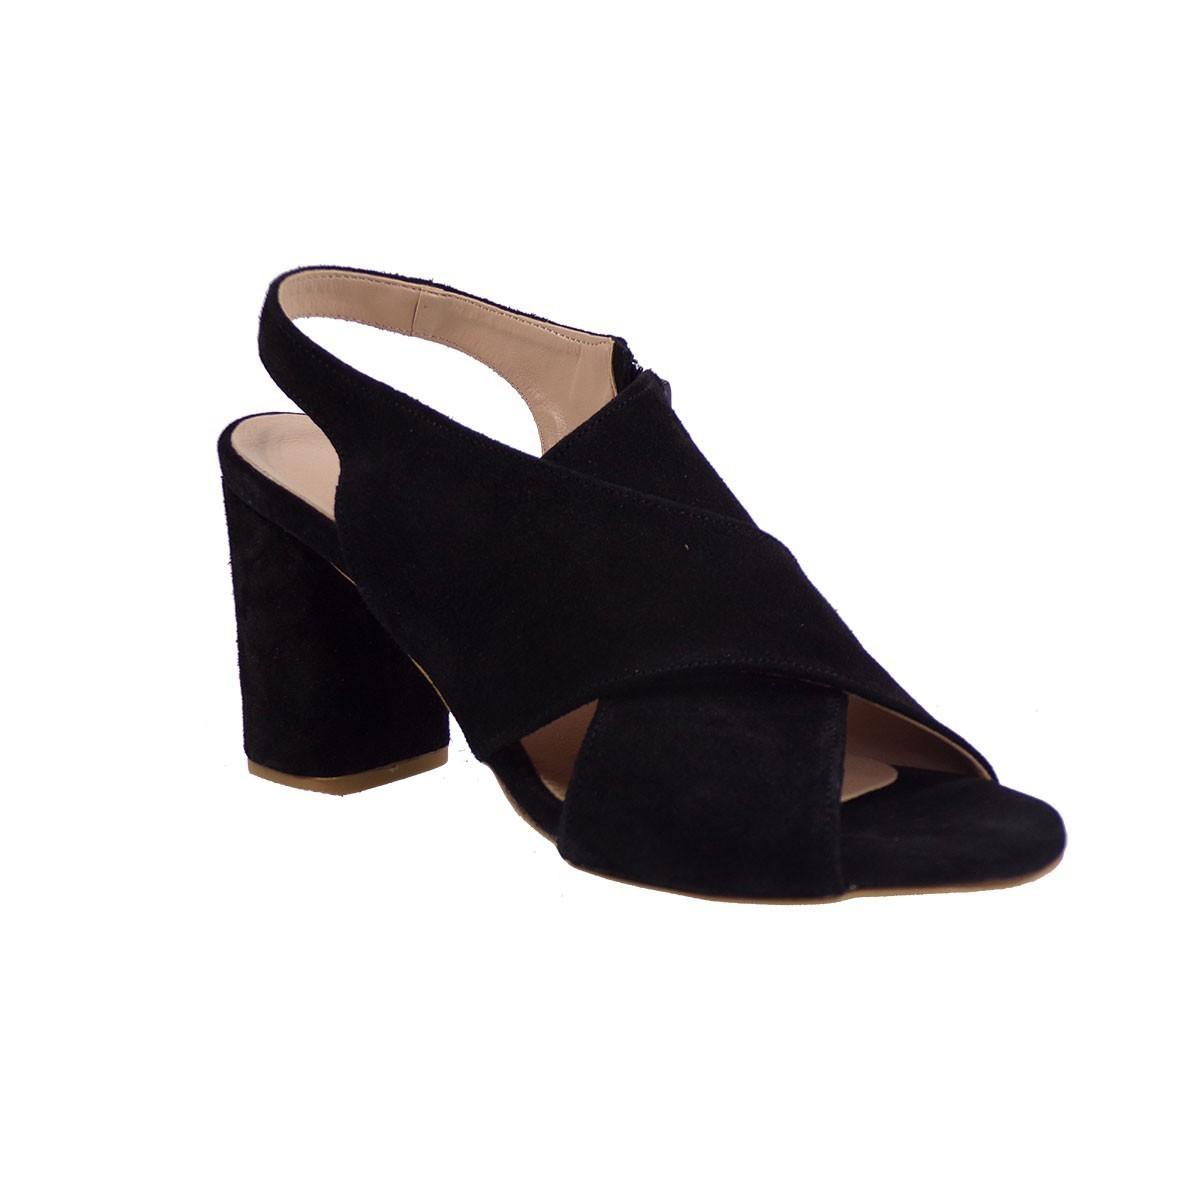 Smart Cronos Γυναικεία Παπούτσια Πέδιλα 6792-3656 Μαύρο Καστόρι Δέρμα